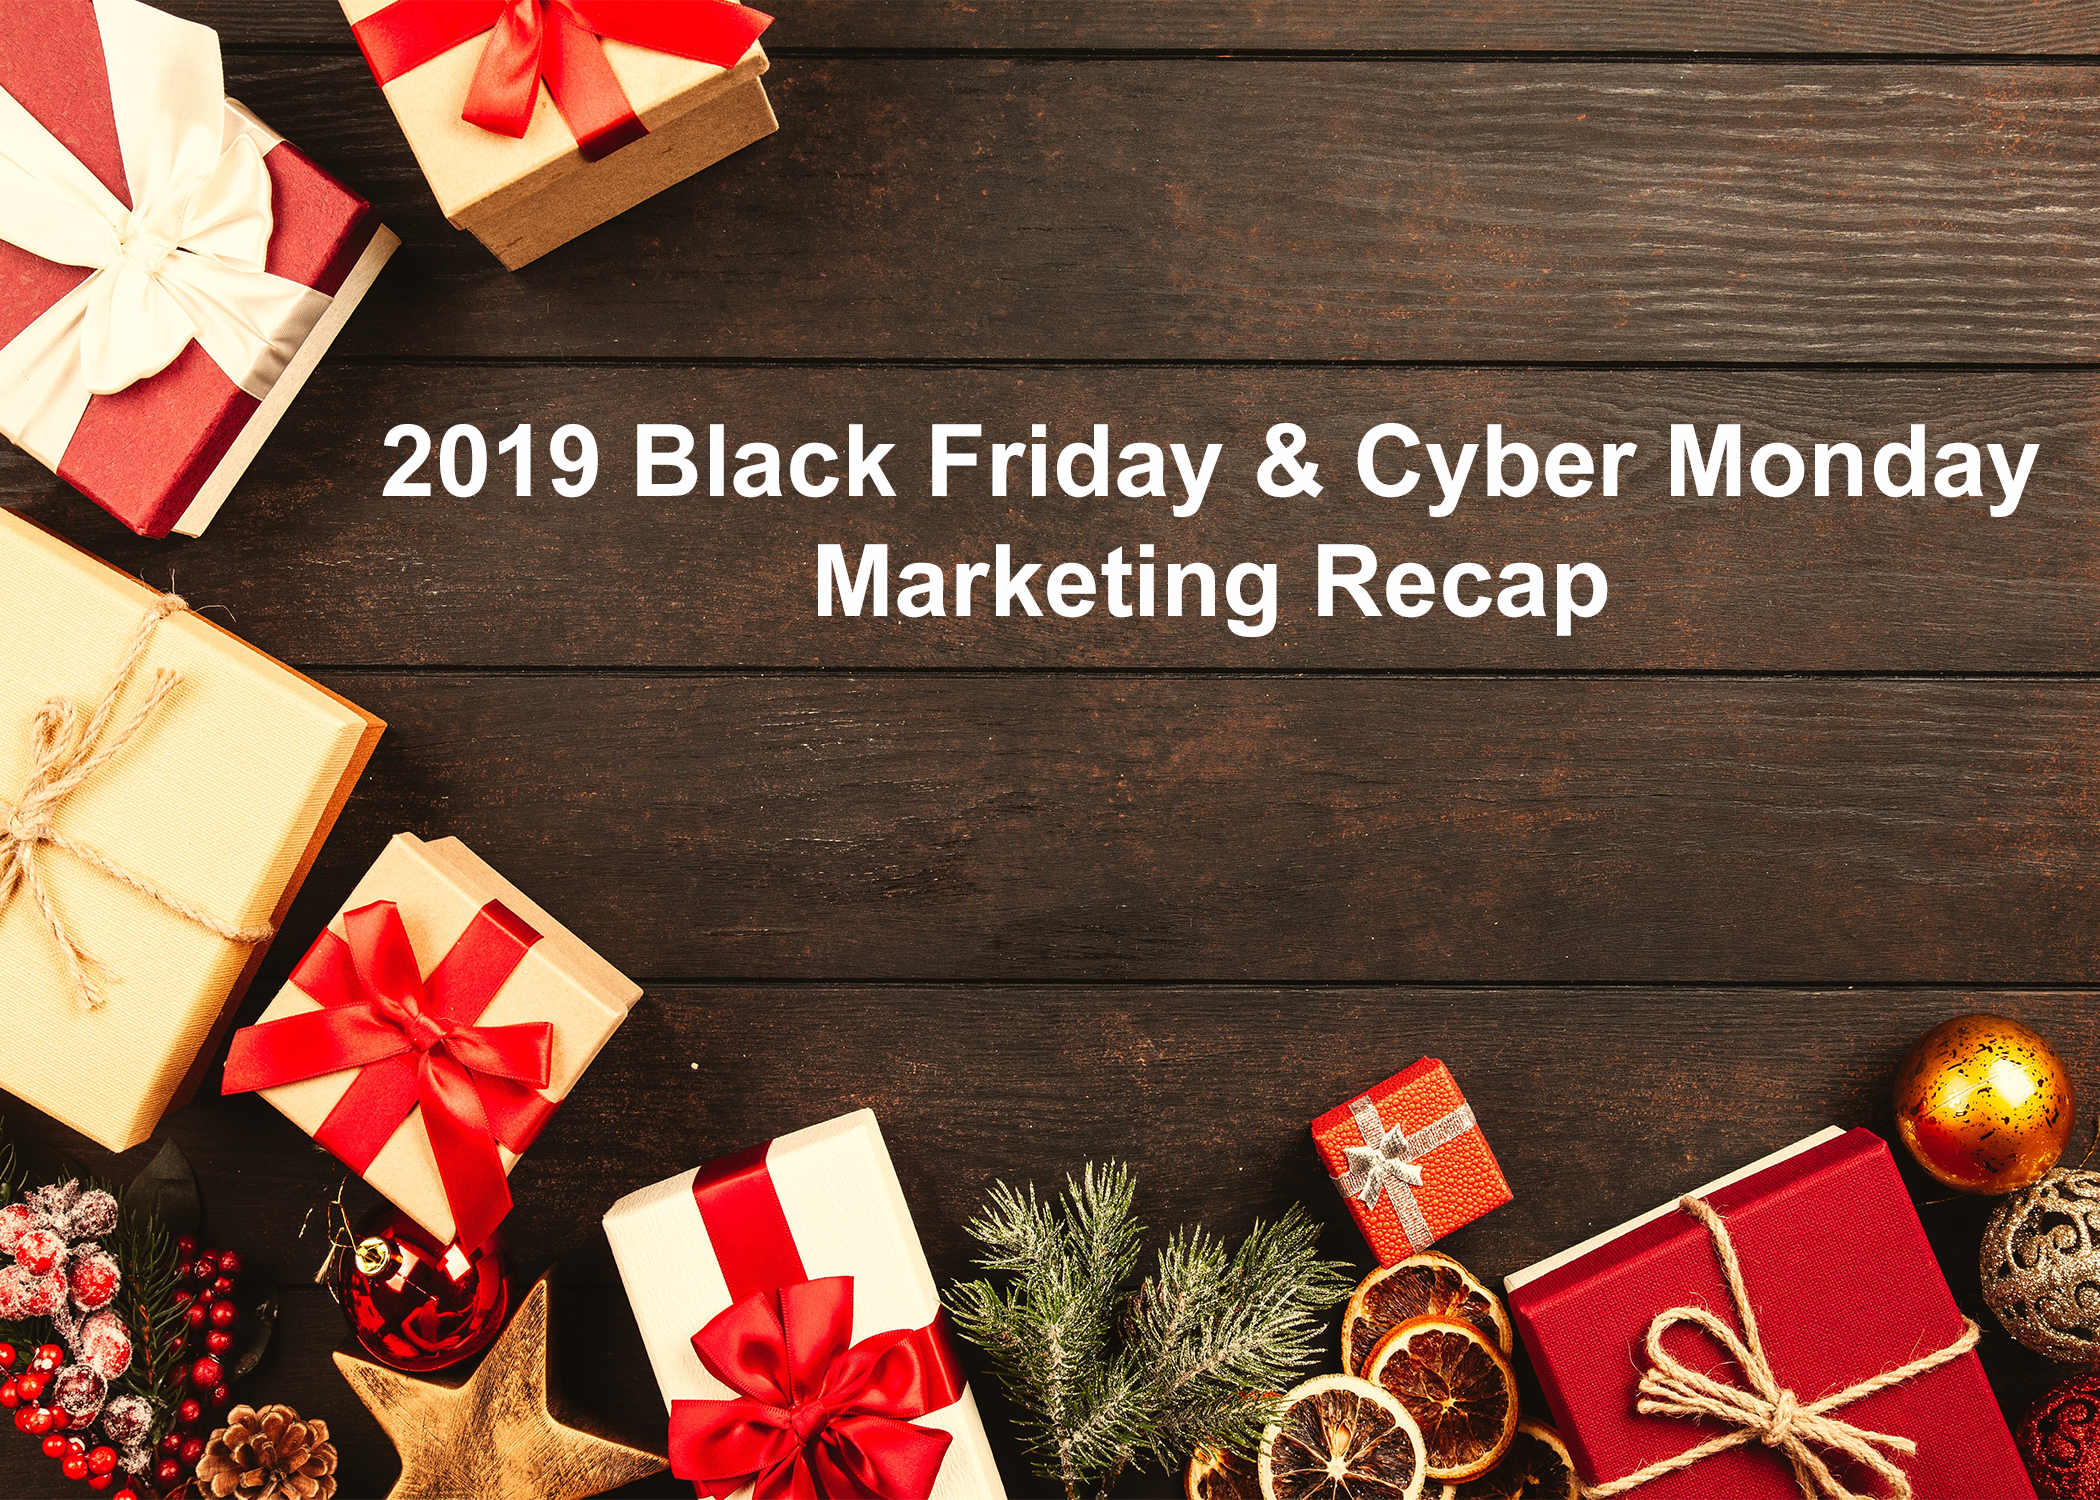 2019 Black Friday & Cyber Monday Marketing Recap